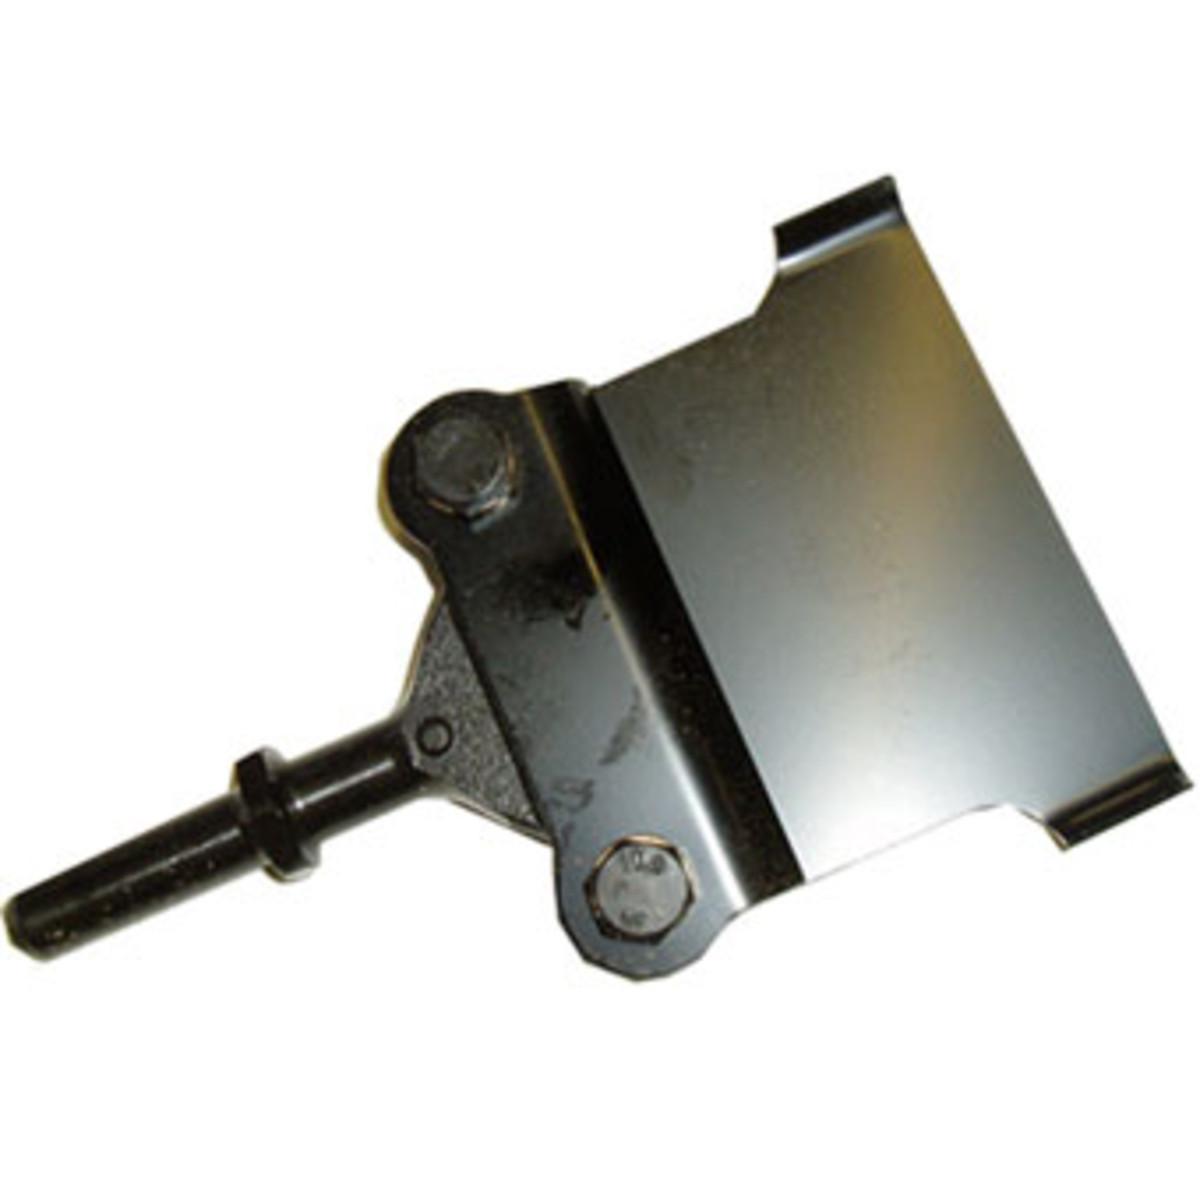 tile removal tool - tile chisel scraper